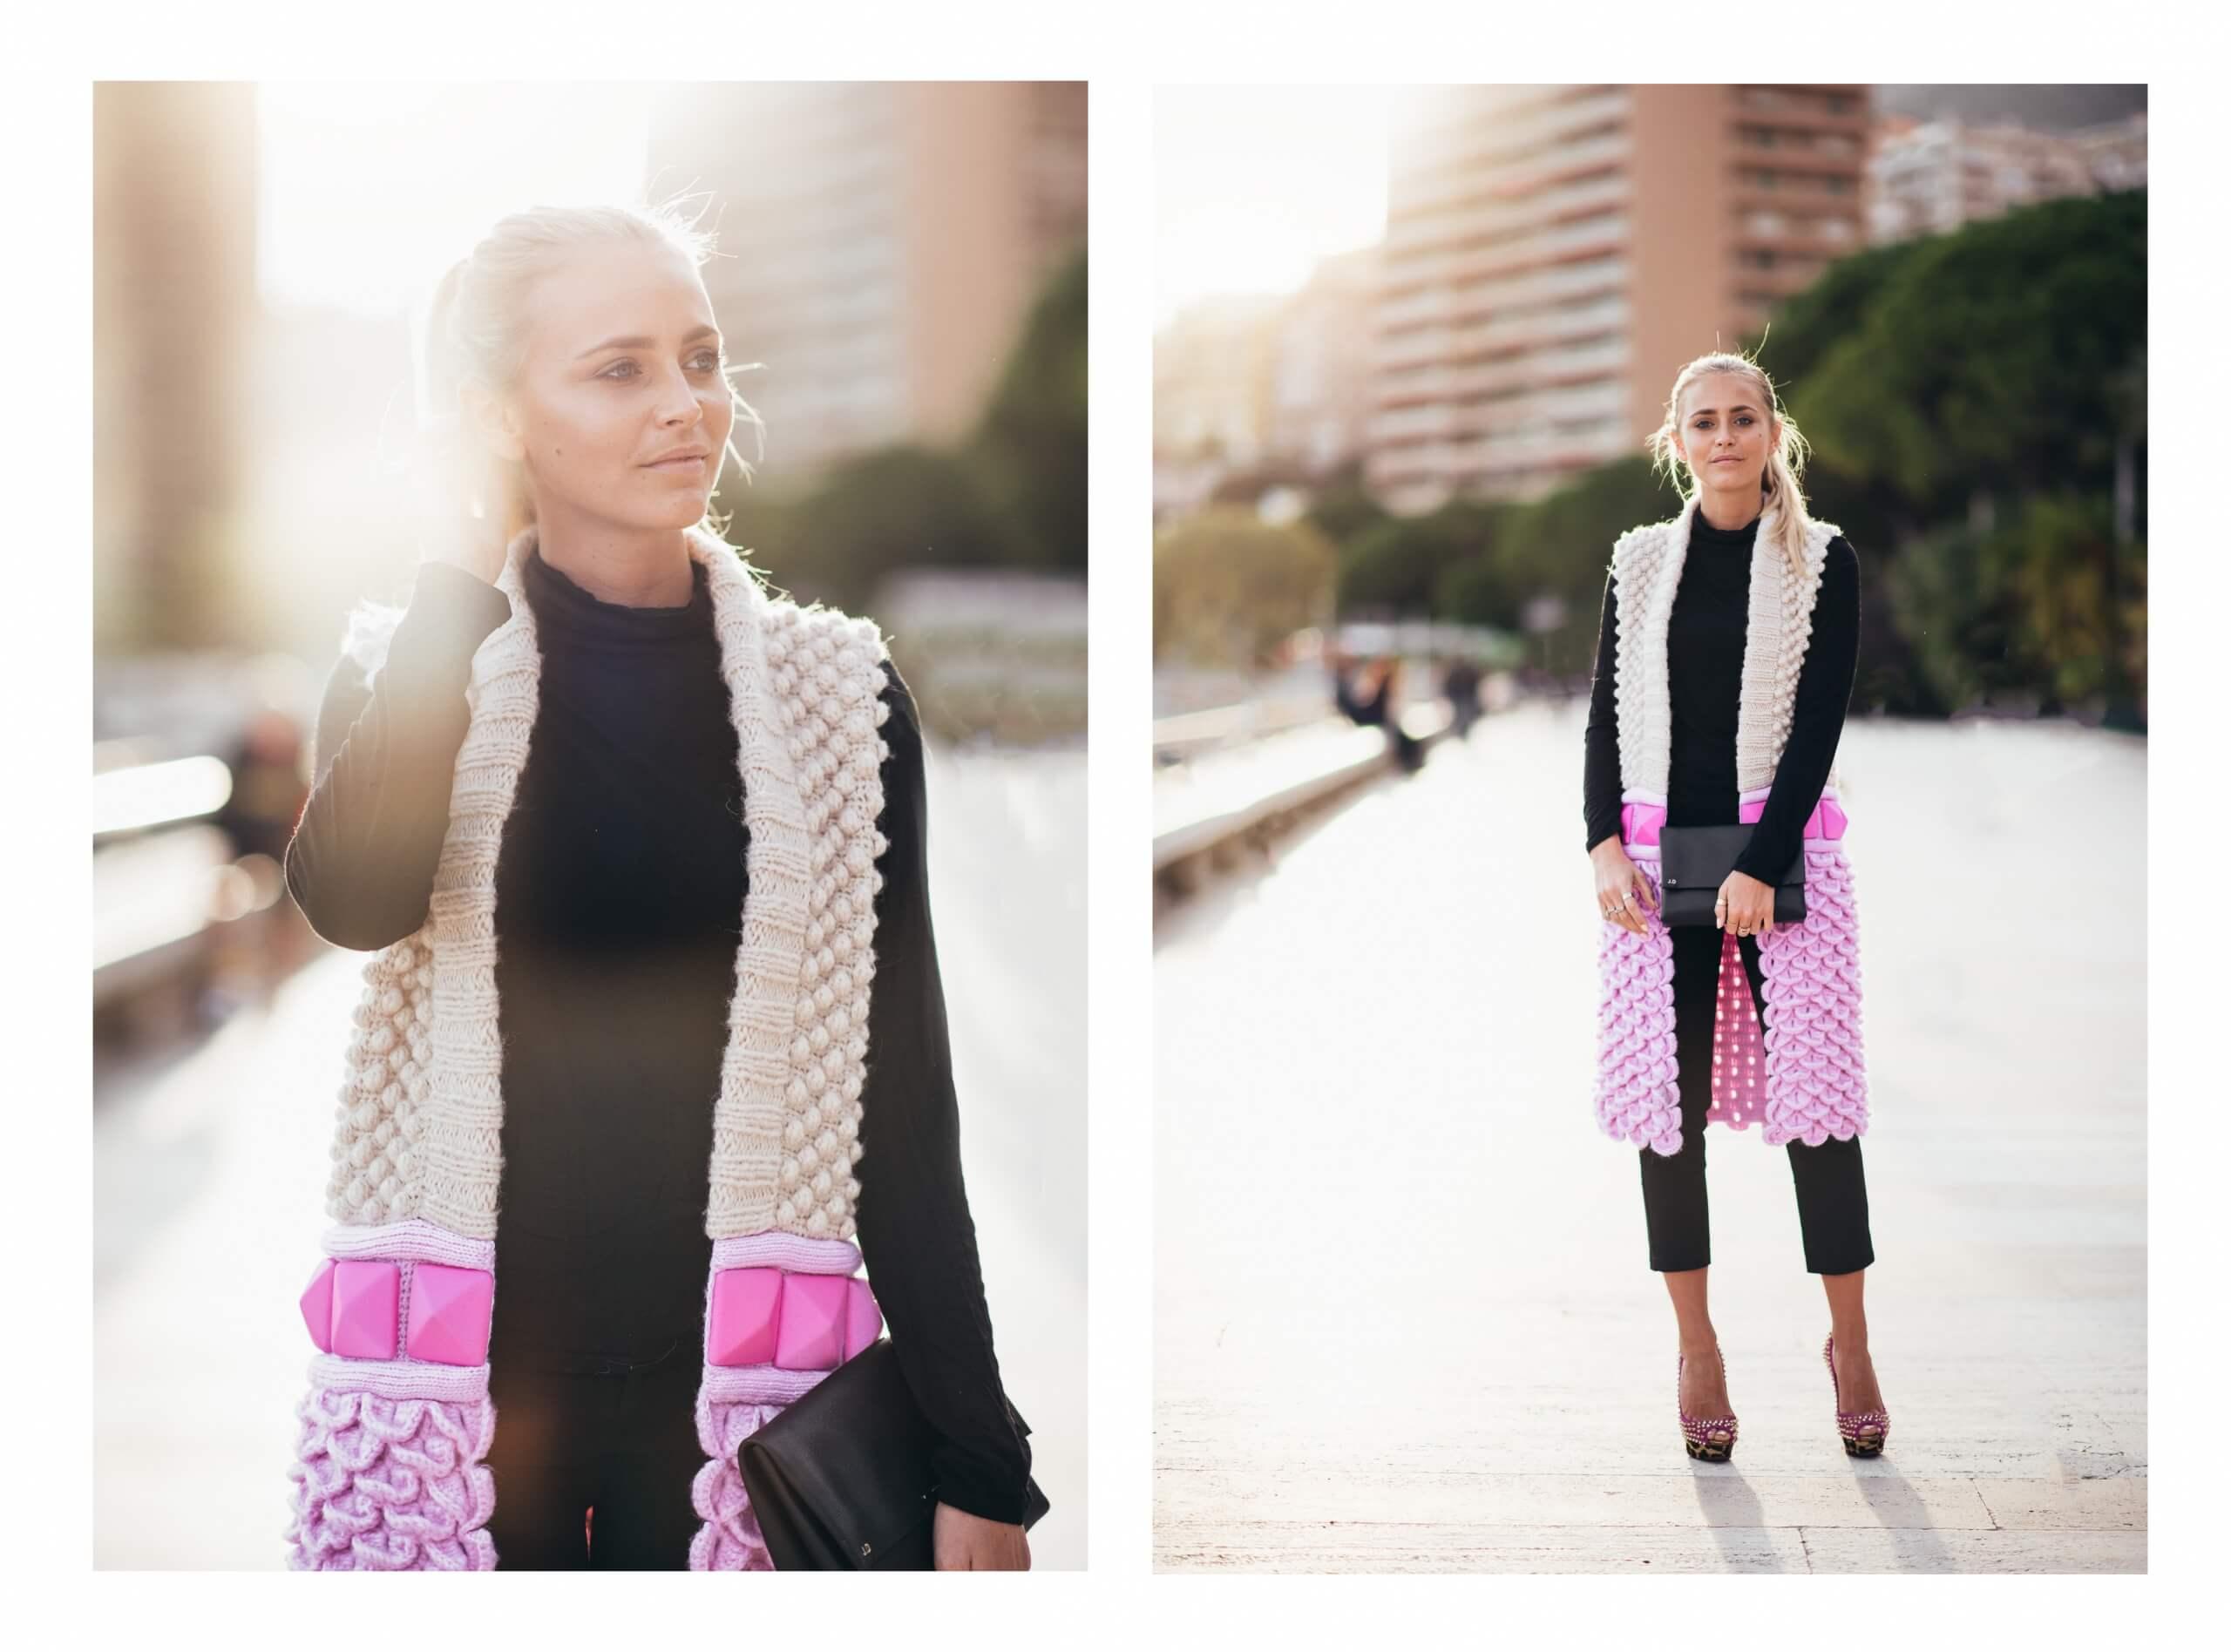 janni-deler-pink-vestdsc_2552-redigera-copy